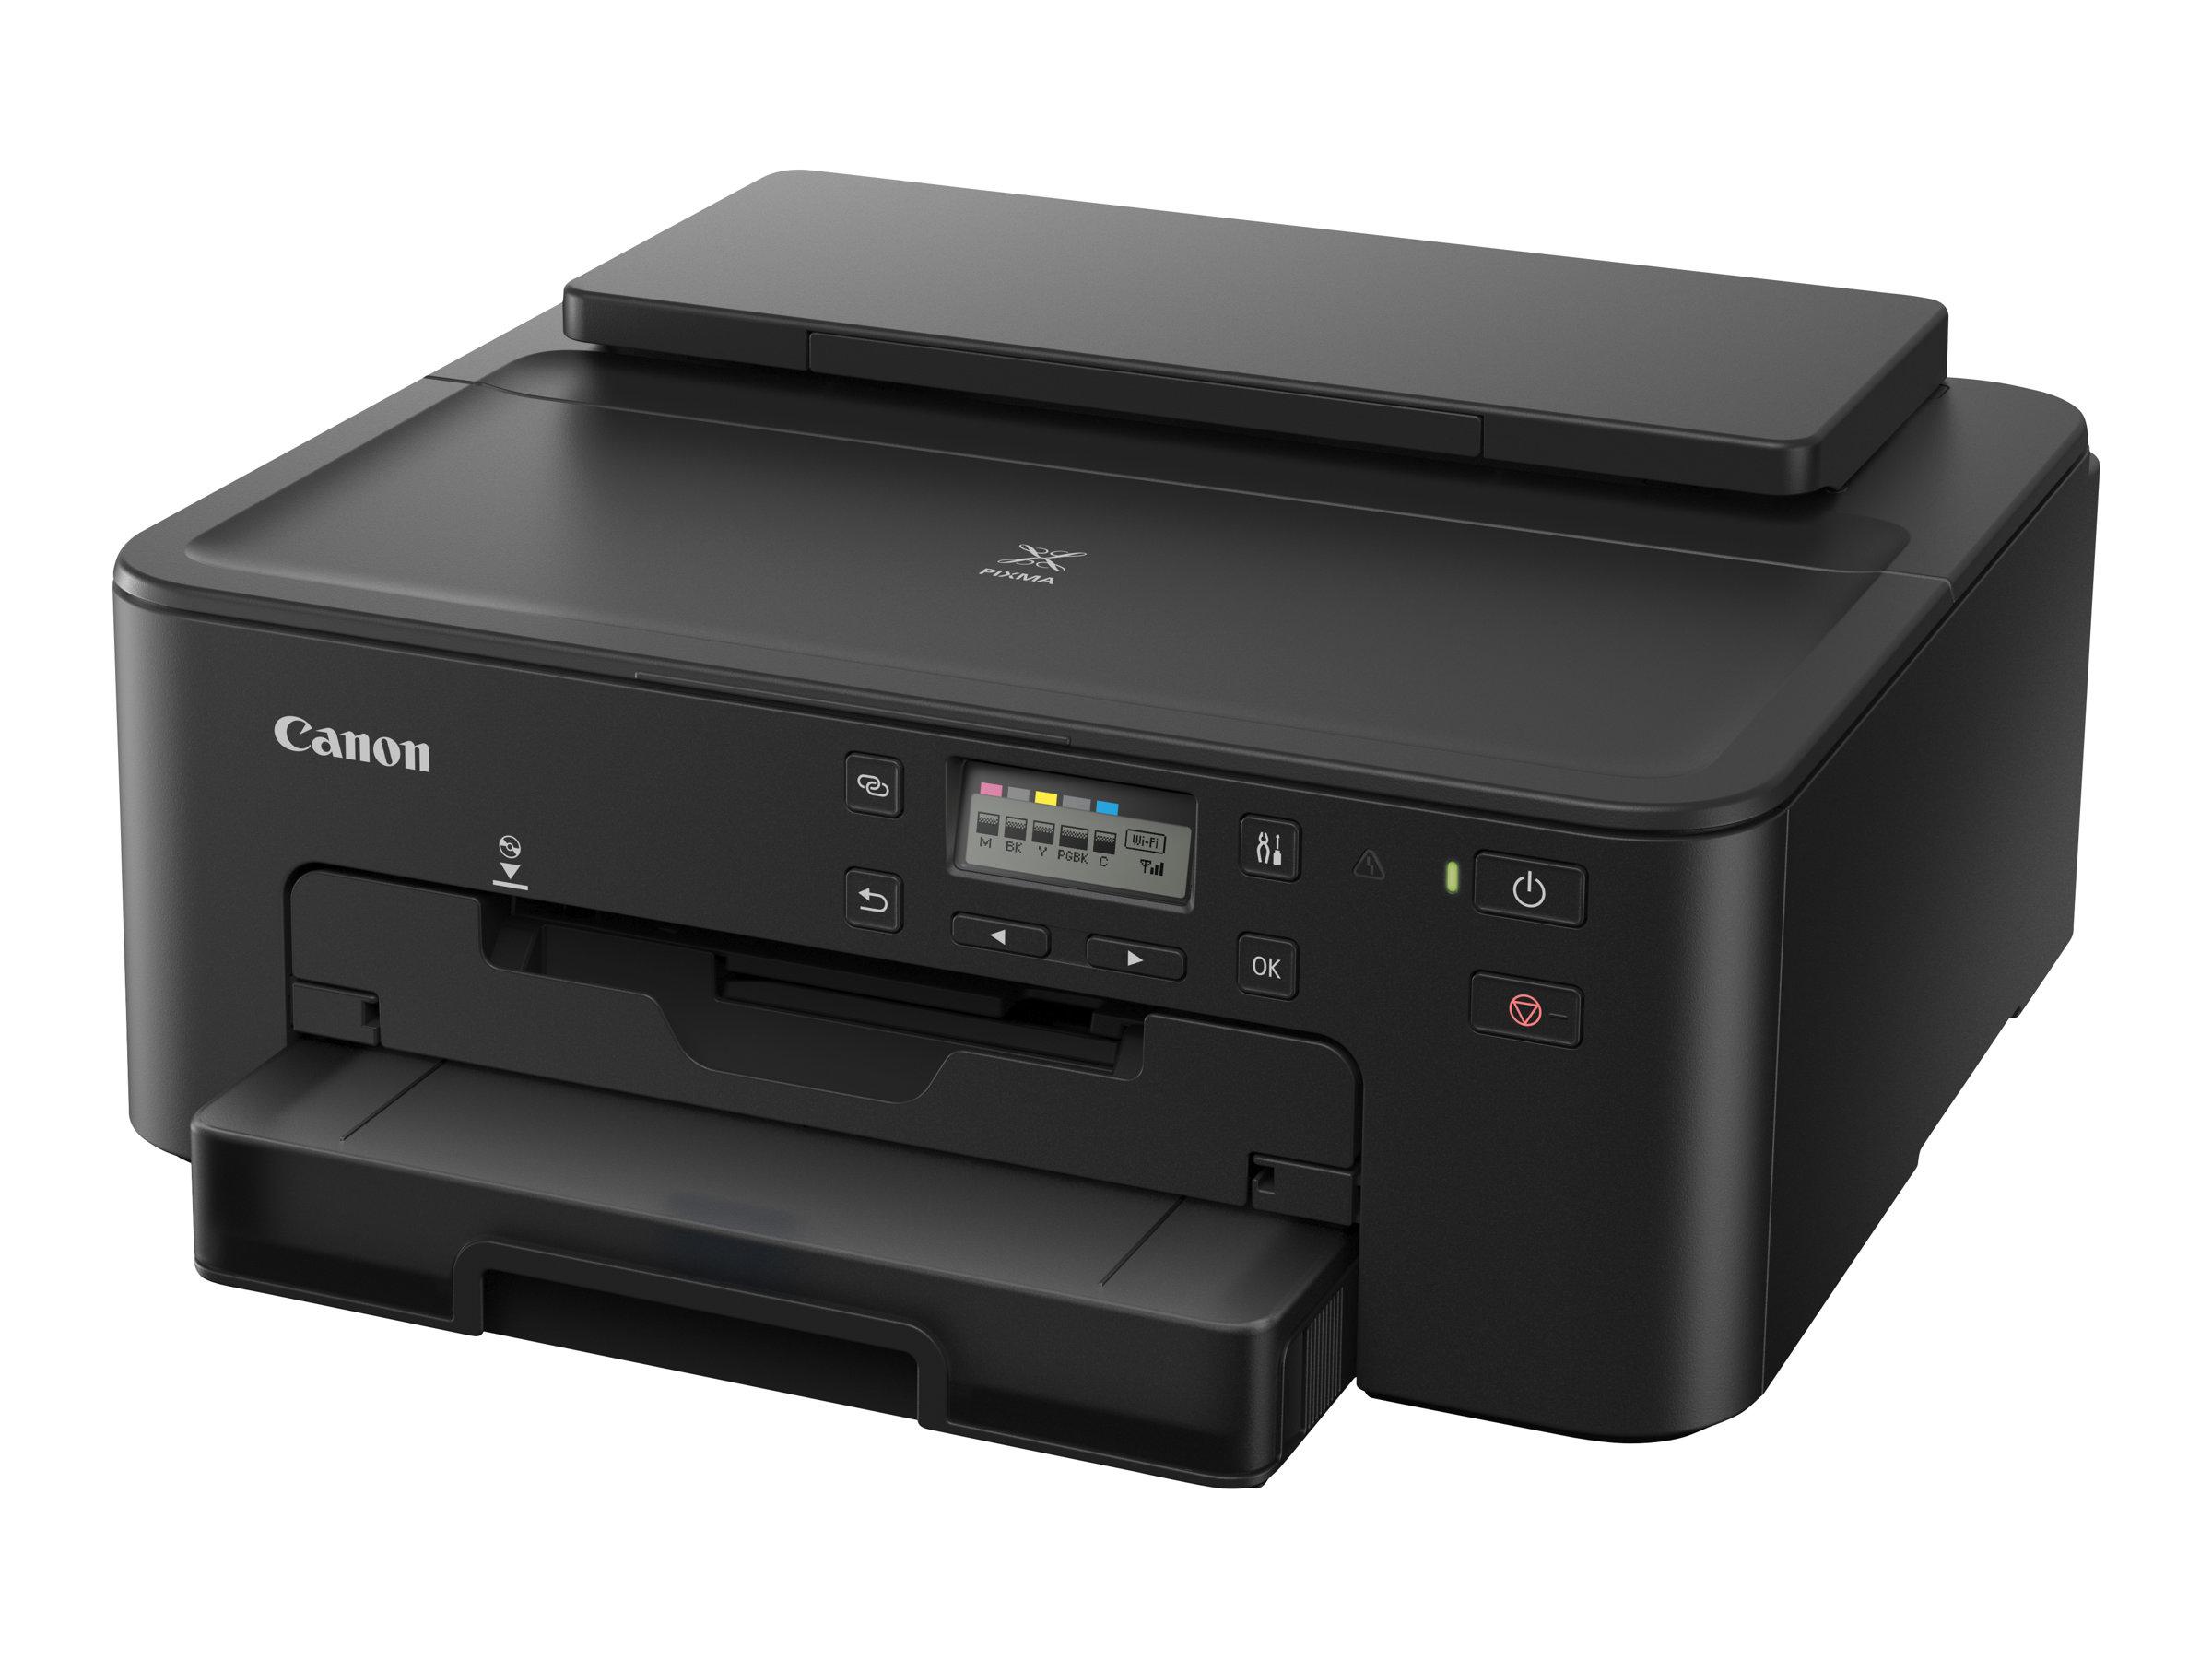 Canon PIXMA TS705 - Drucker - Farbe - Duplex - Tintenstrahl - A4/Legal